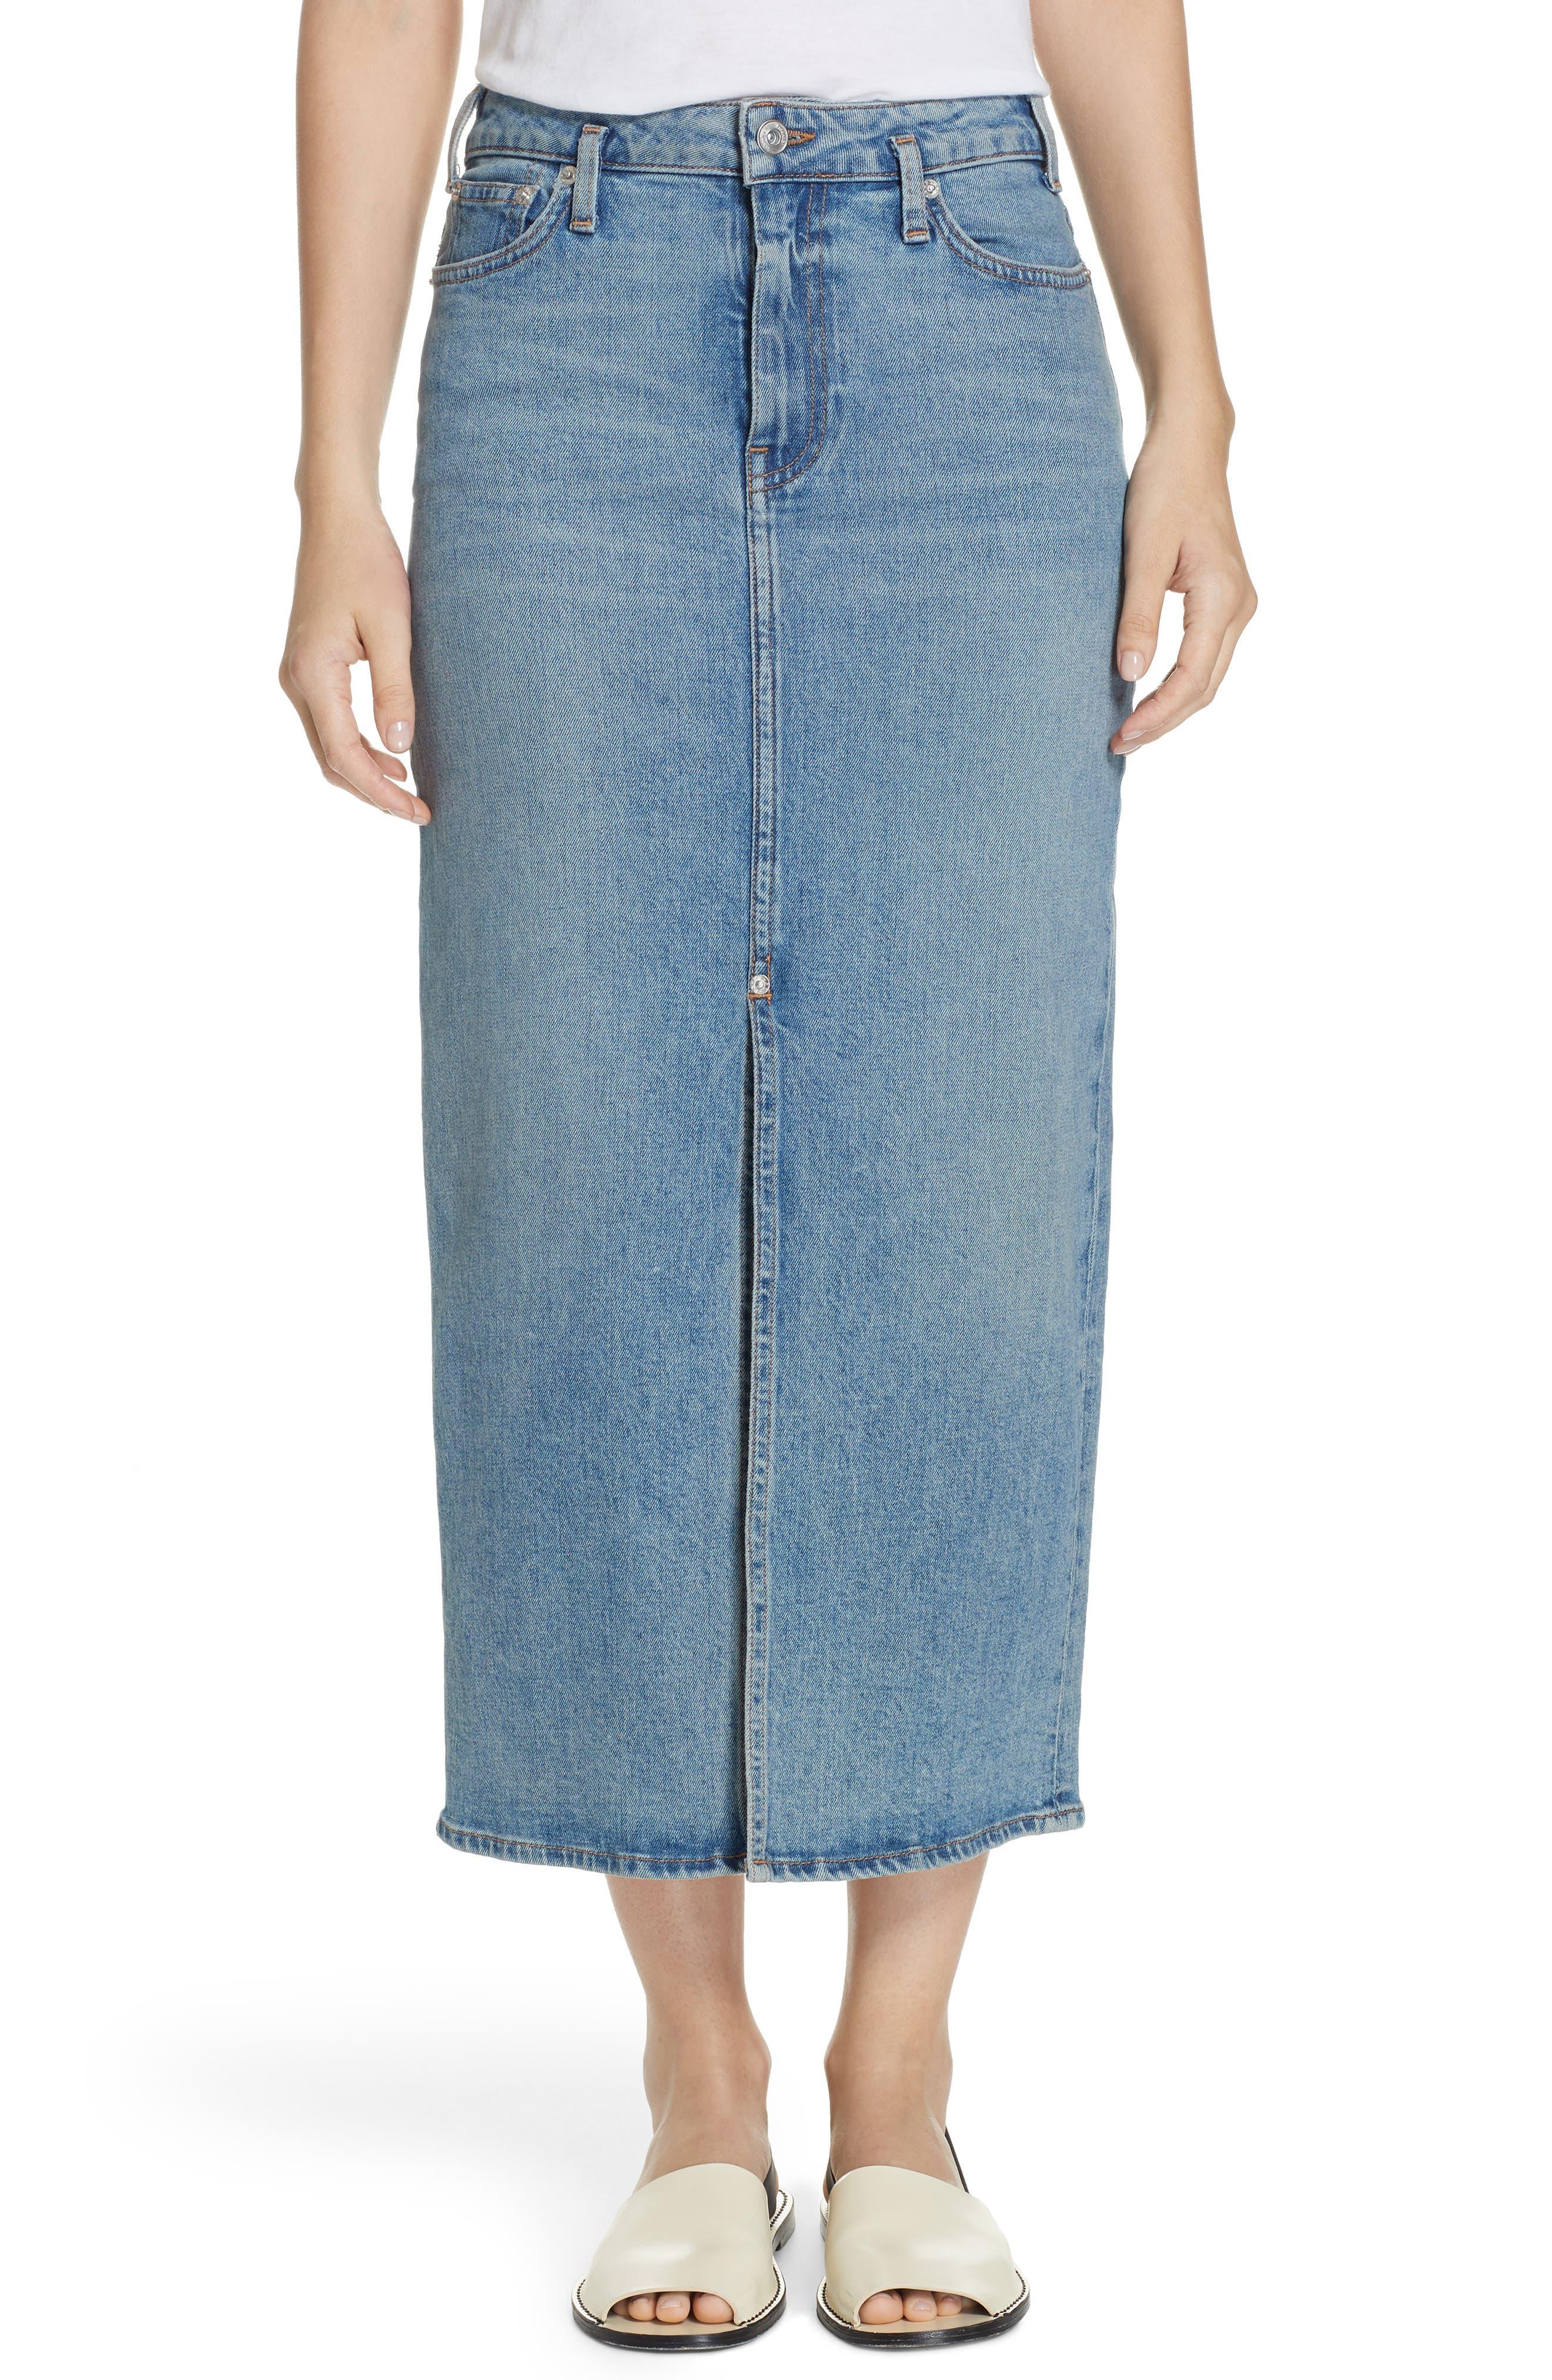 PROENZA SCHOULER Slit Seam Denim Midi Skirt, Main, color, CALIFORNIA